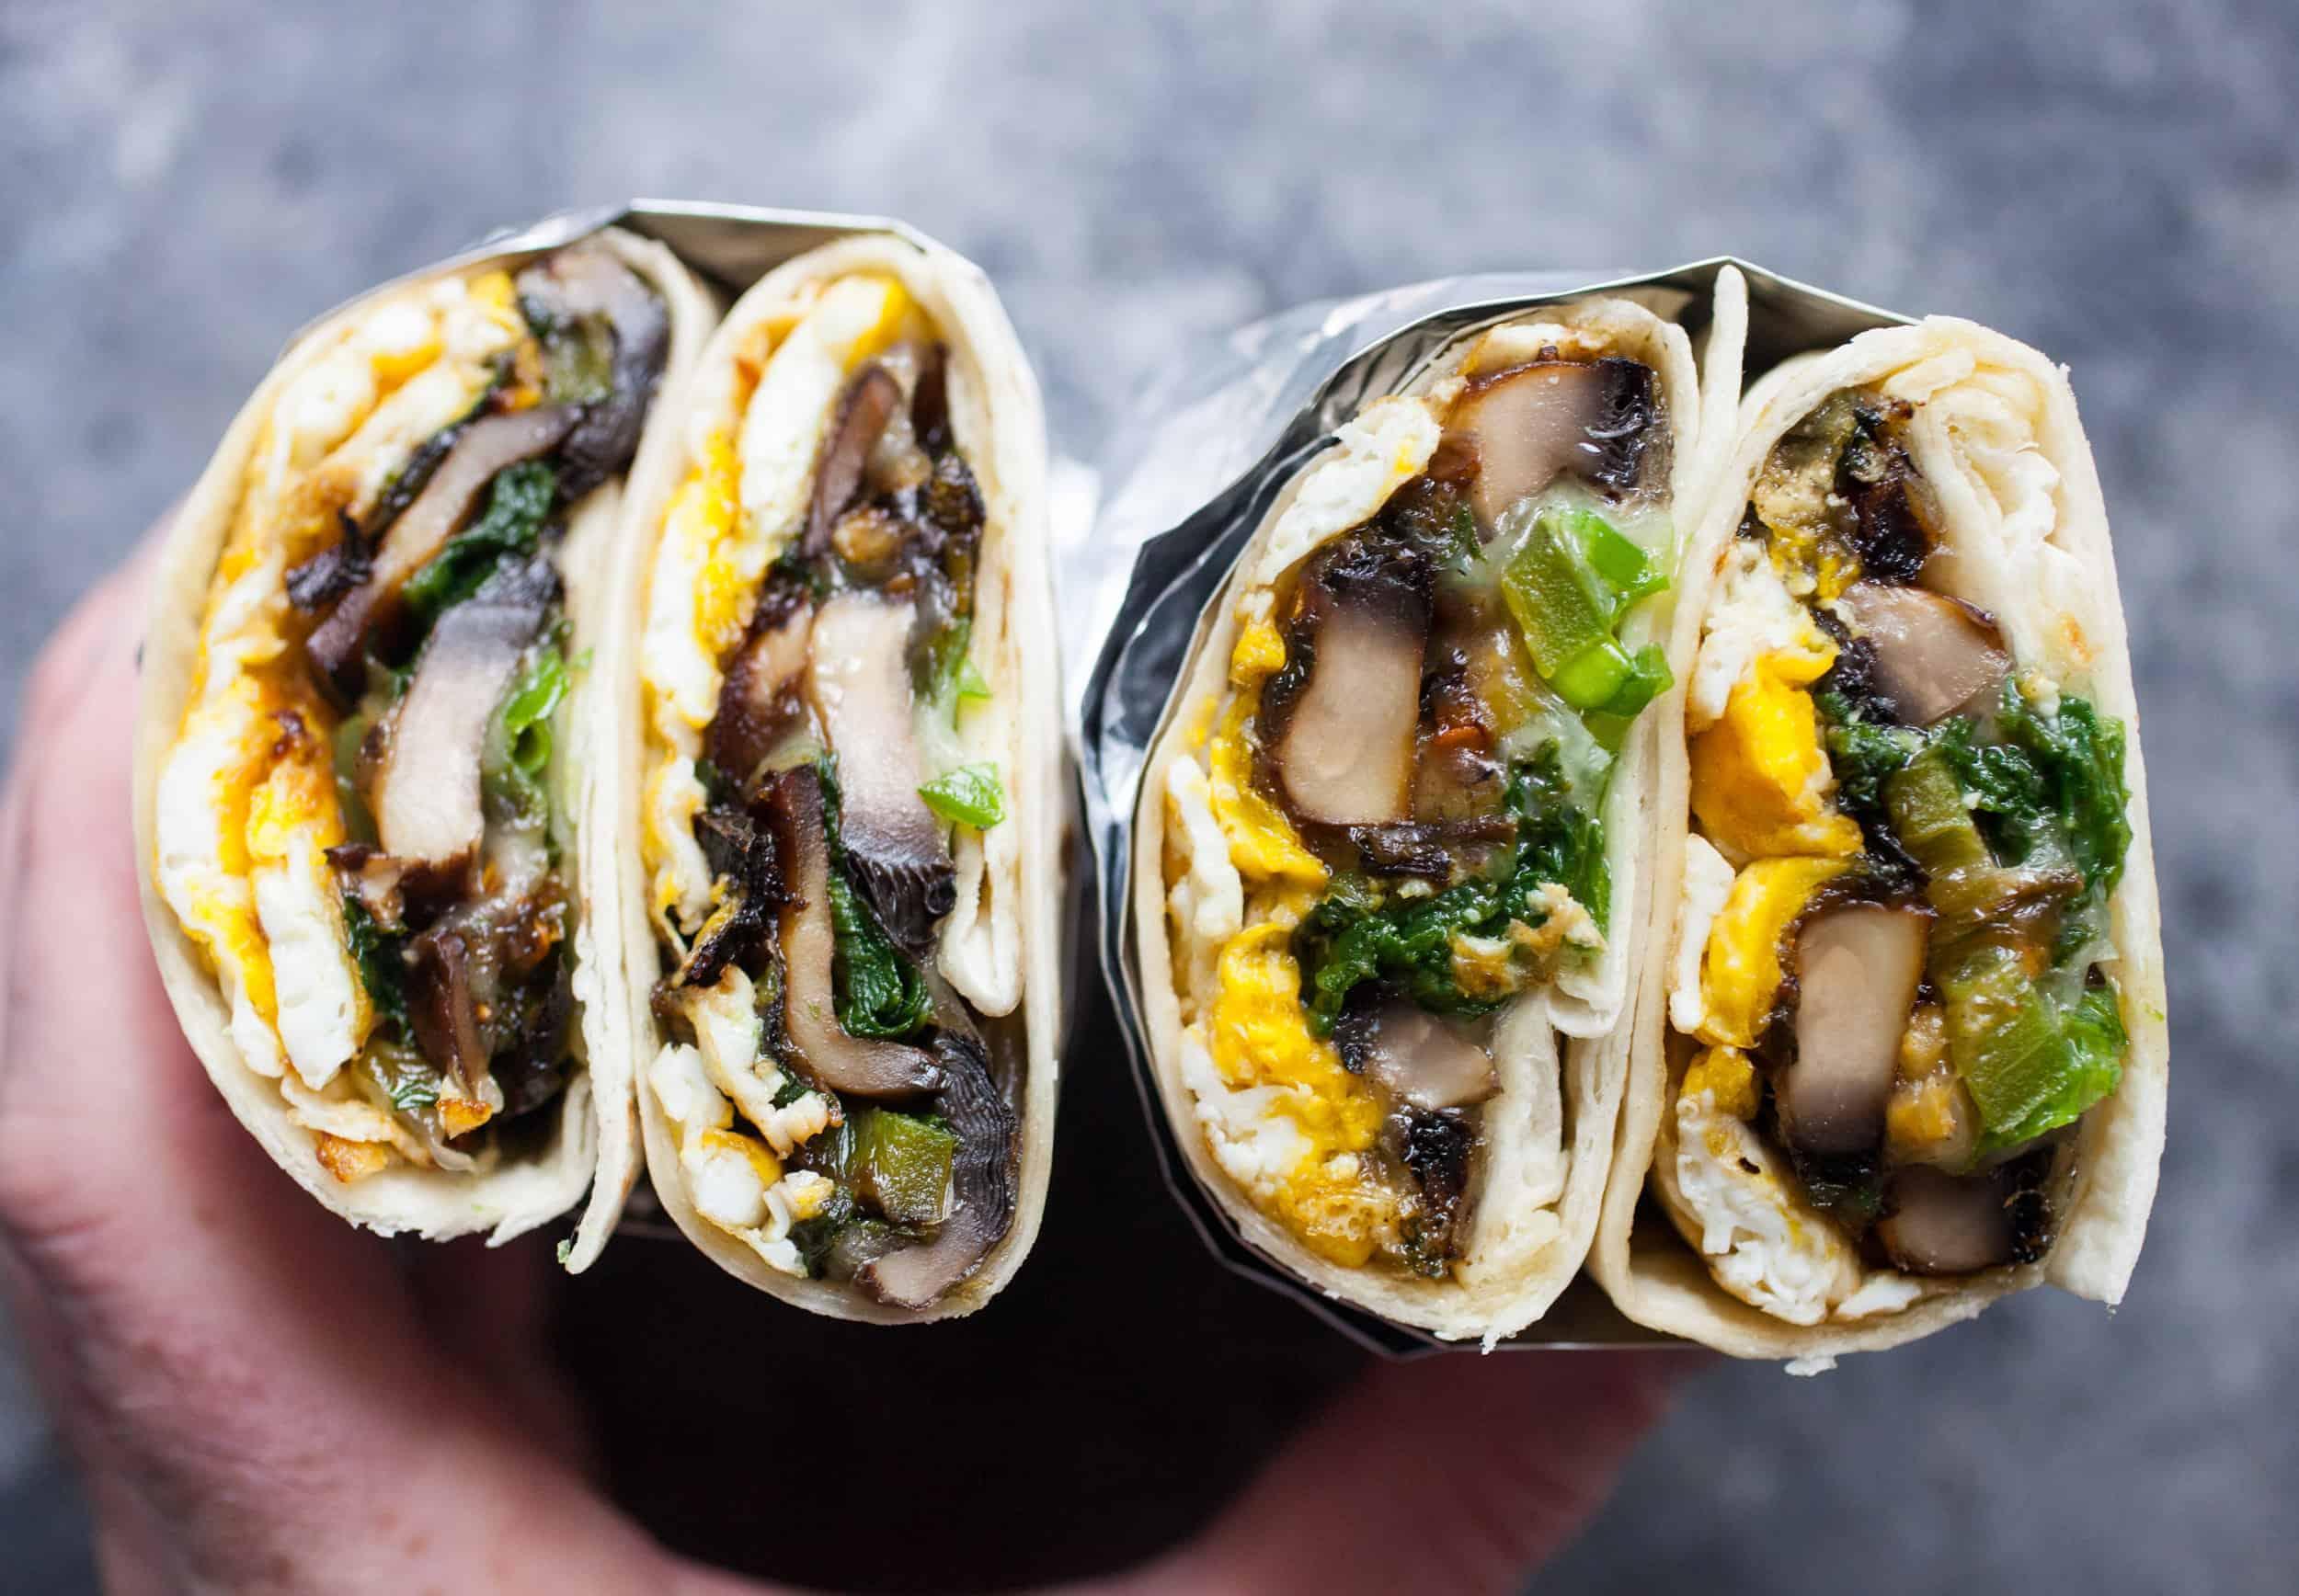 Spicy Mushroom Swiss Breakfast Wrap